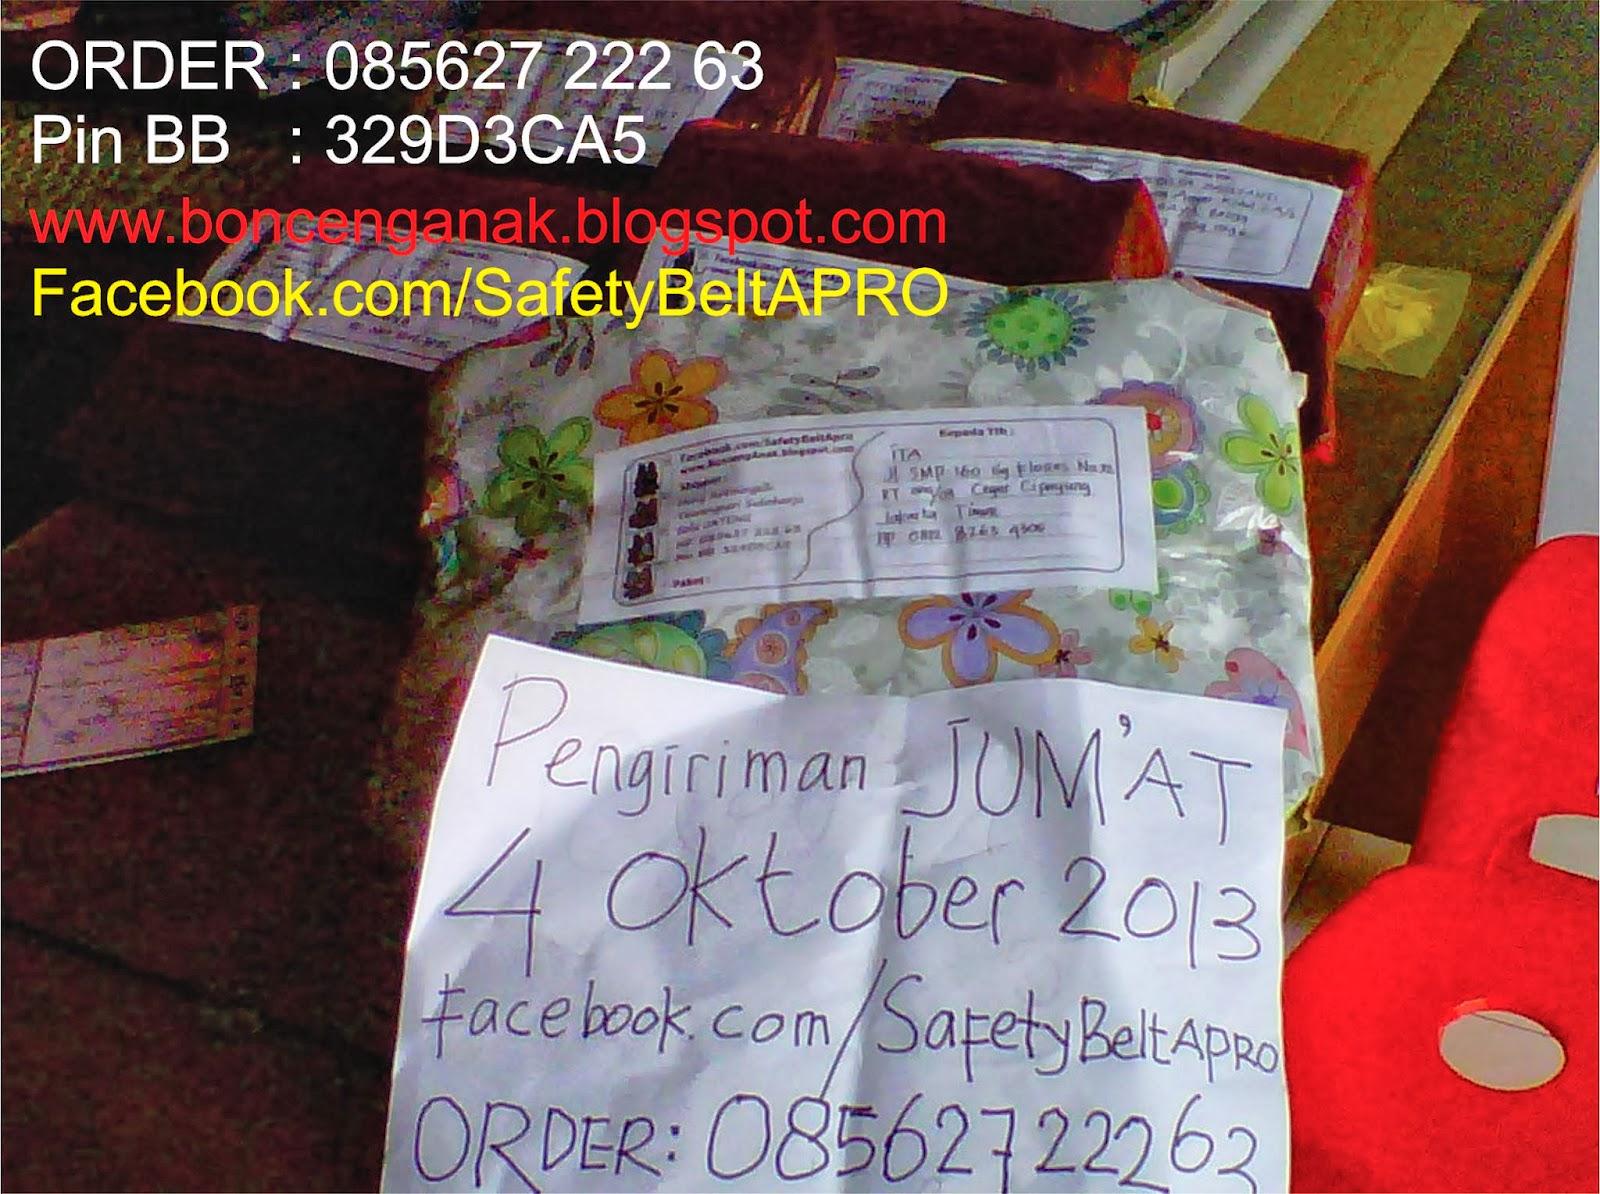 Rp 95000 Pcs Call 085627 222 63 Sabuk Bonceng Anak Apro Motor Safety Belt Untuk Kamis 17 Oktober 2013